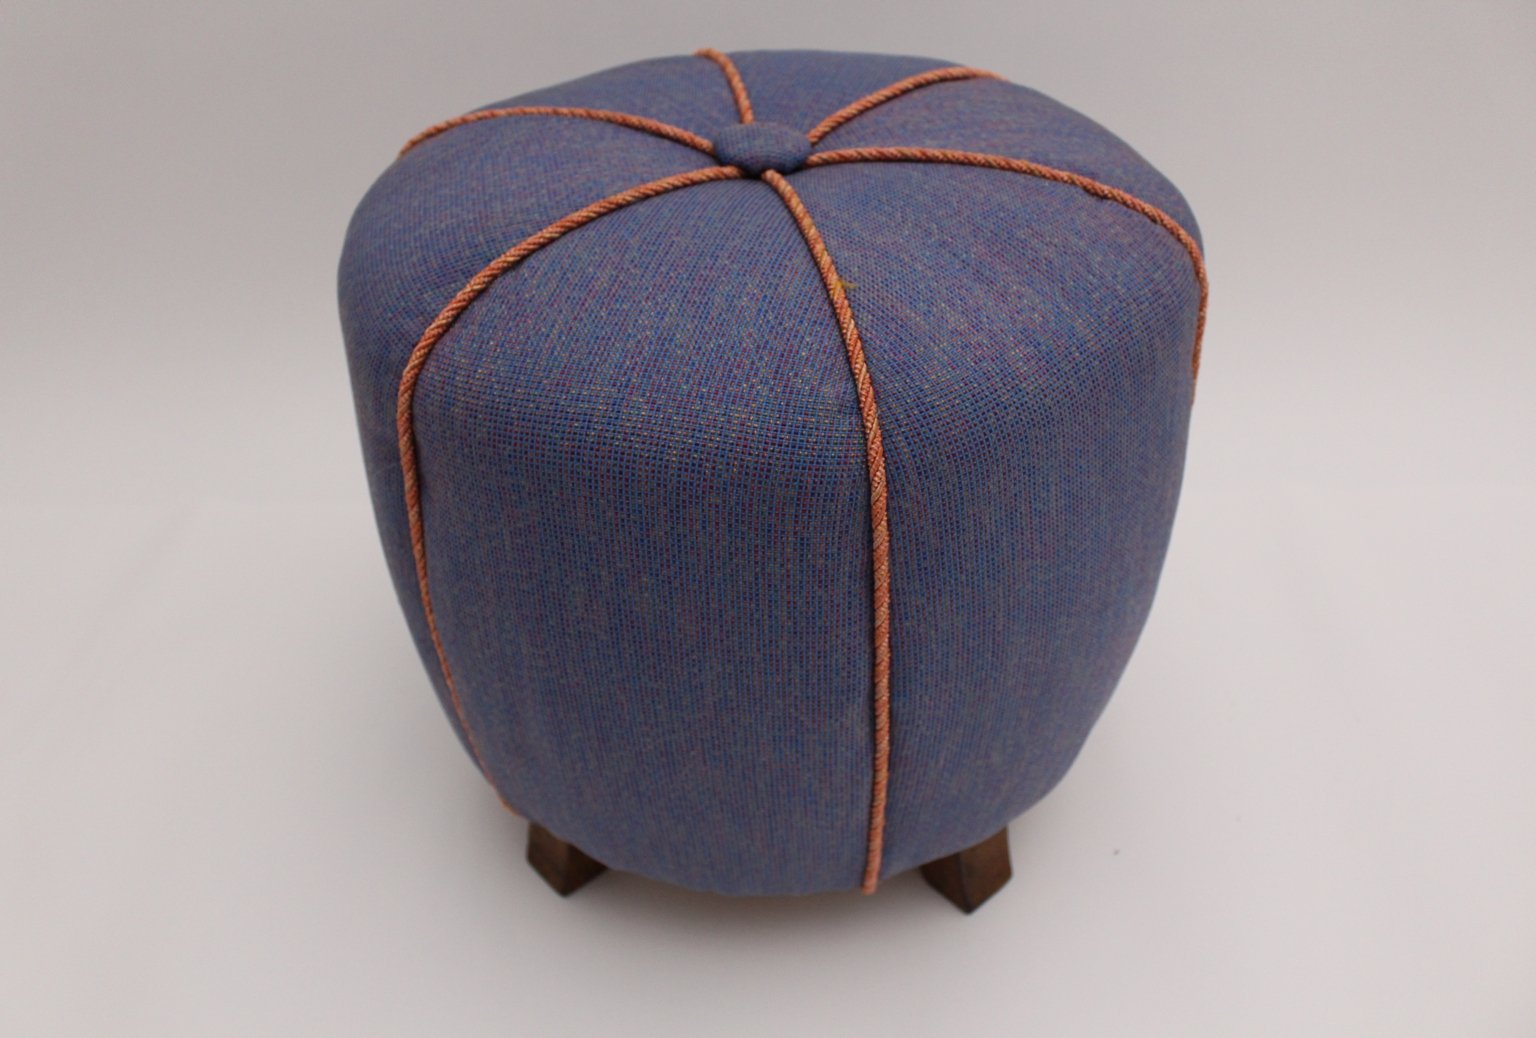 blauer art deco pouf 1930er bei pamono kaufen. Black Bedroom Furniture Sets. Home Design Ideas